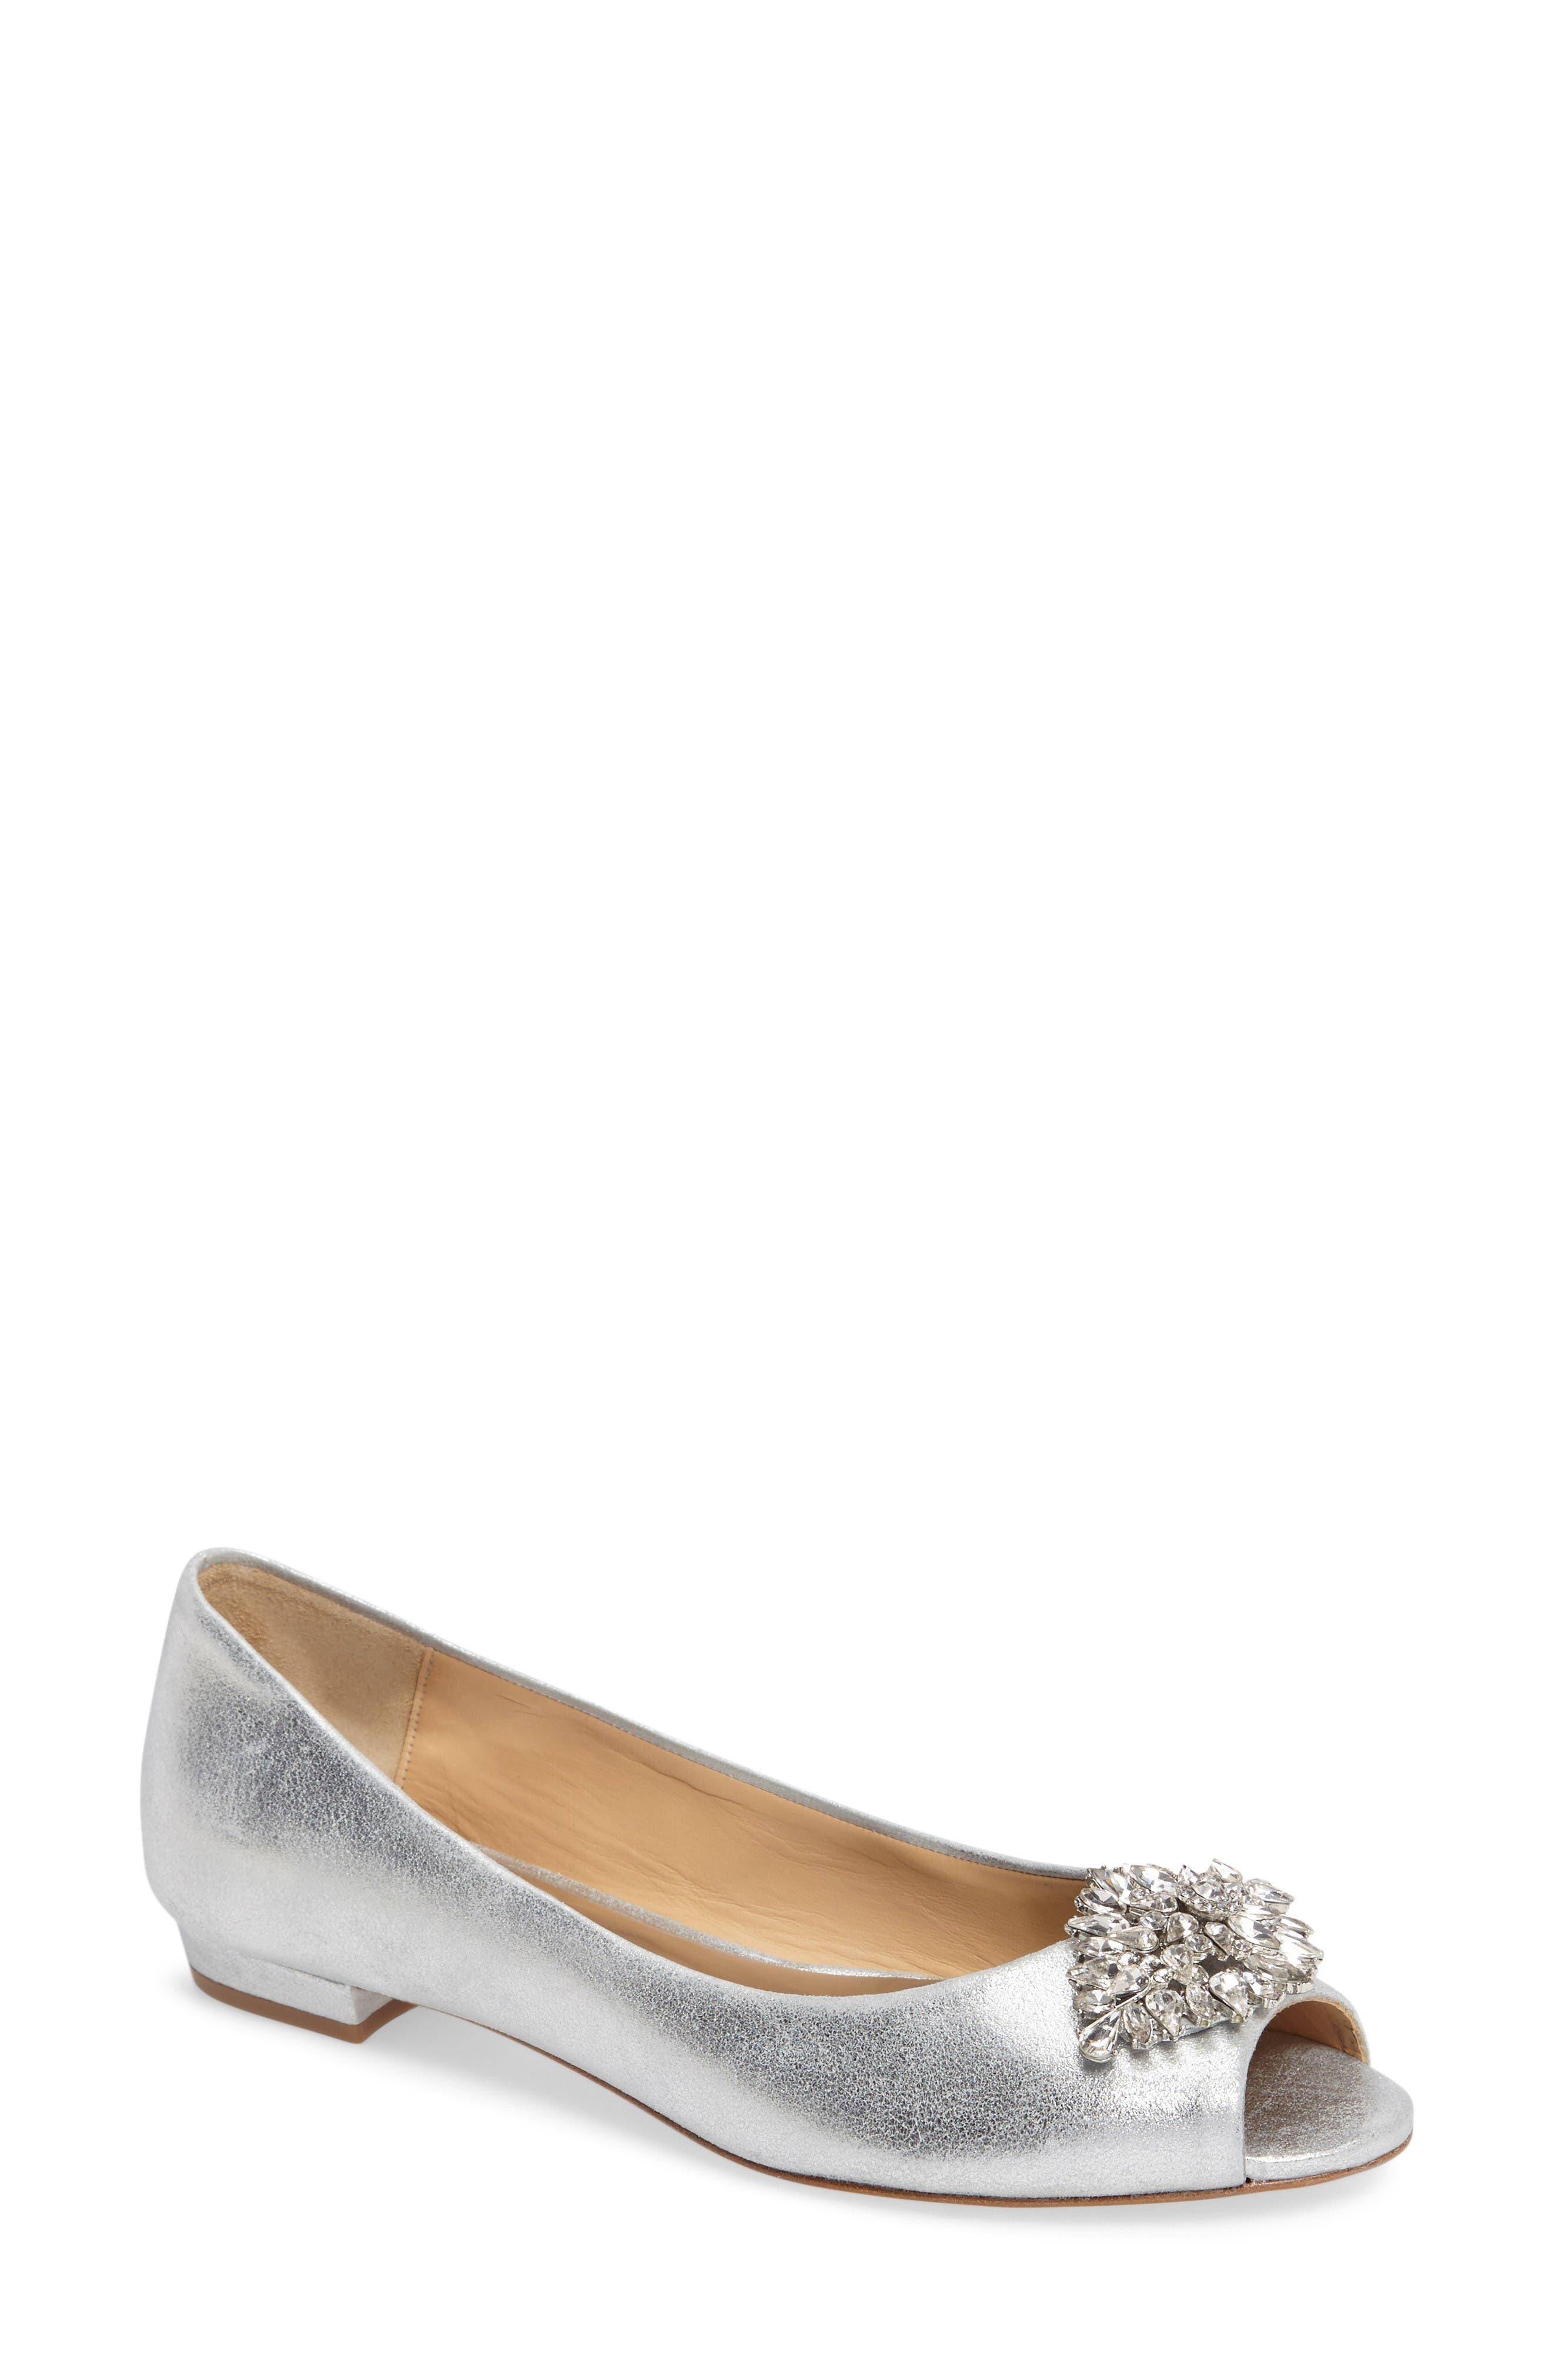 Taft Peep Toe Flat,                             Main thumbnail 1, color,                             Silver Metallic Suede